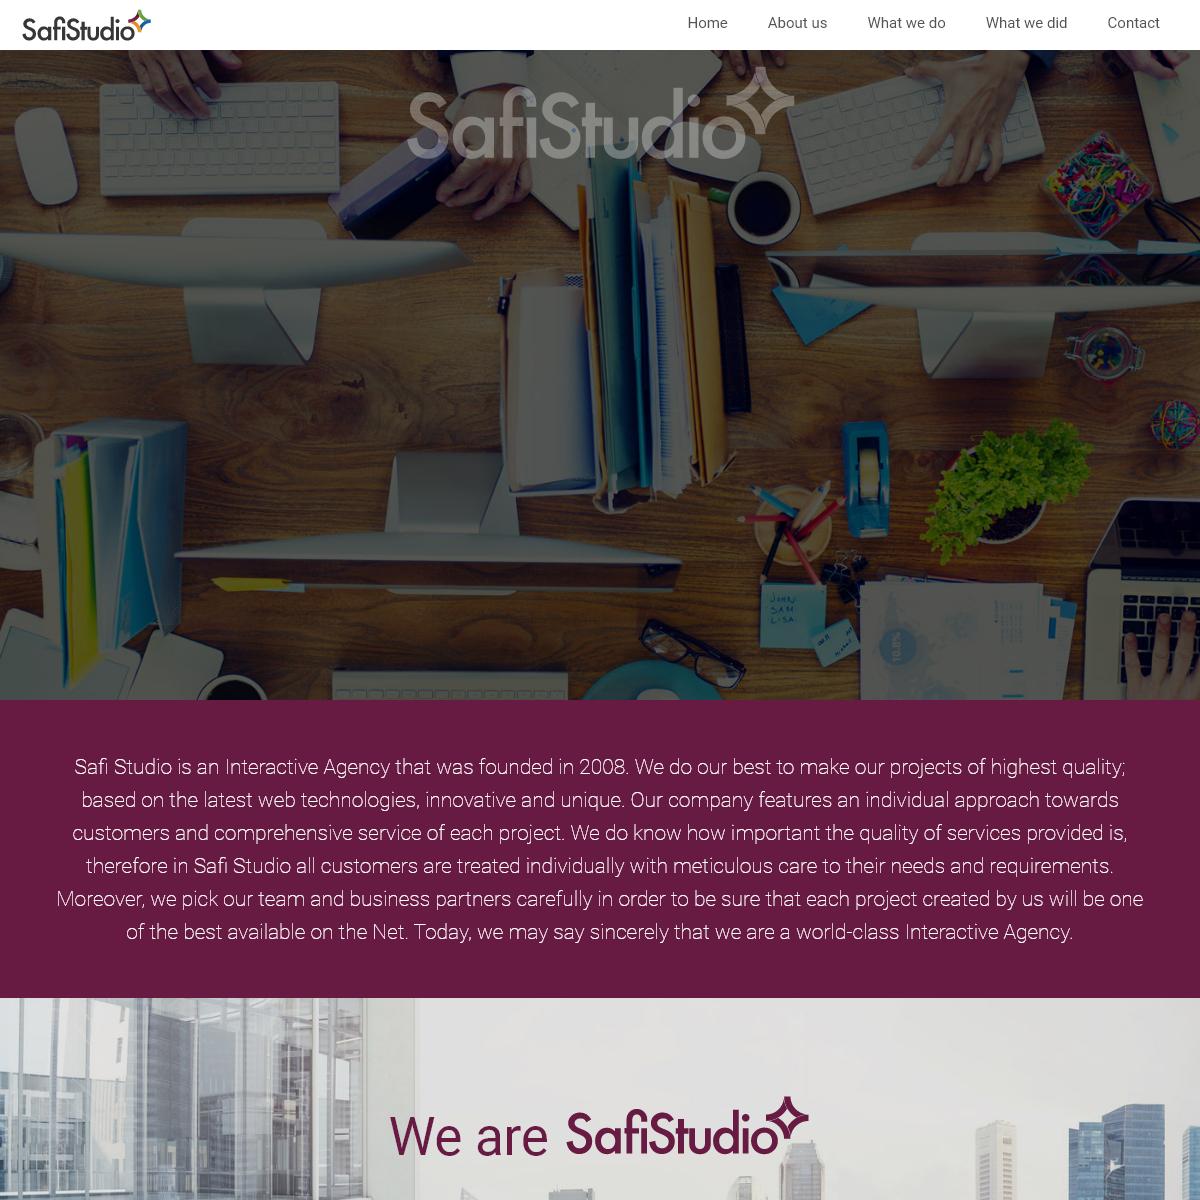 Safi Studio - websites on the highest level